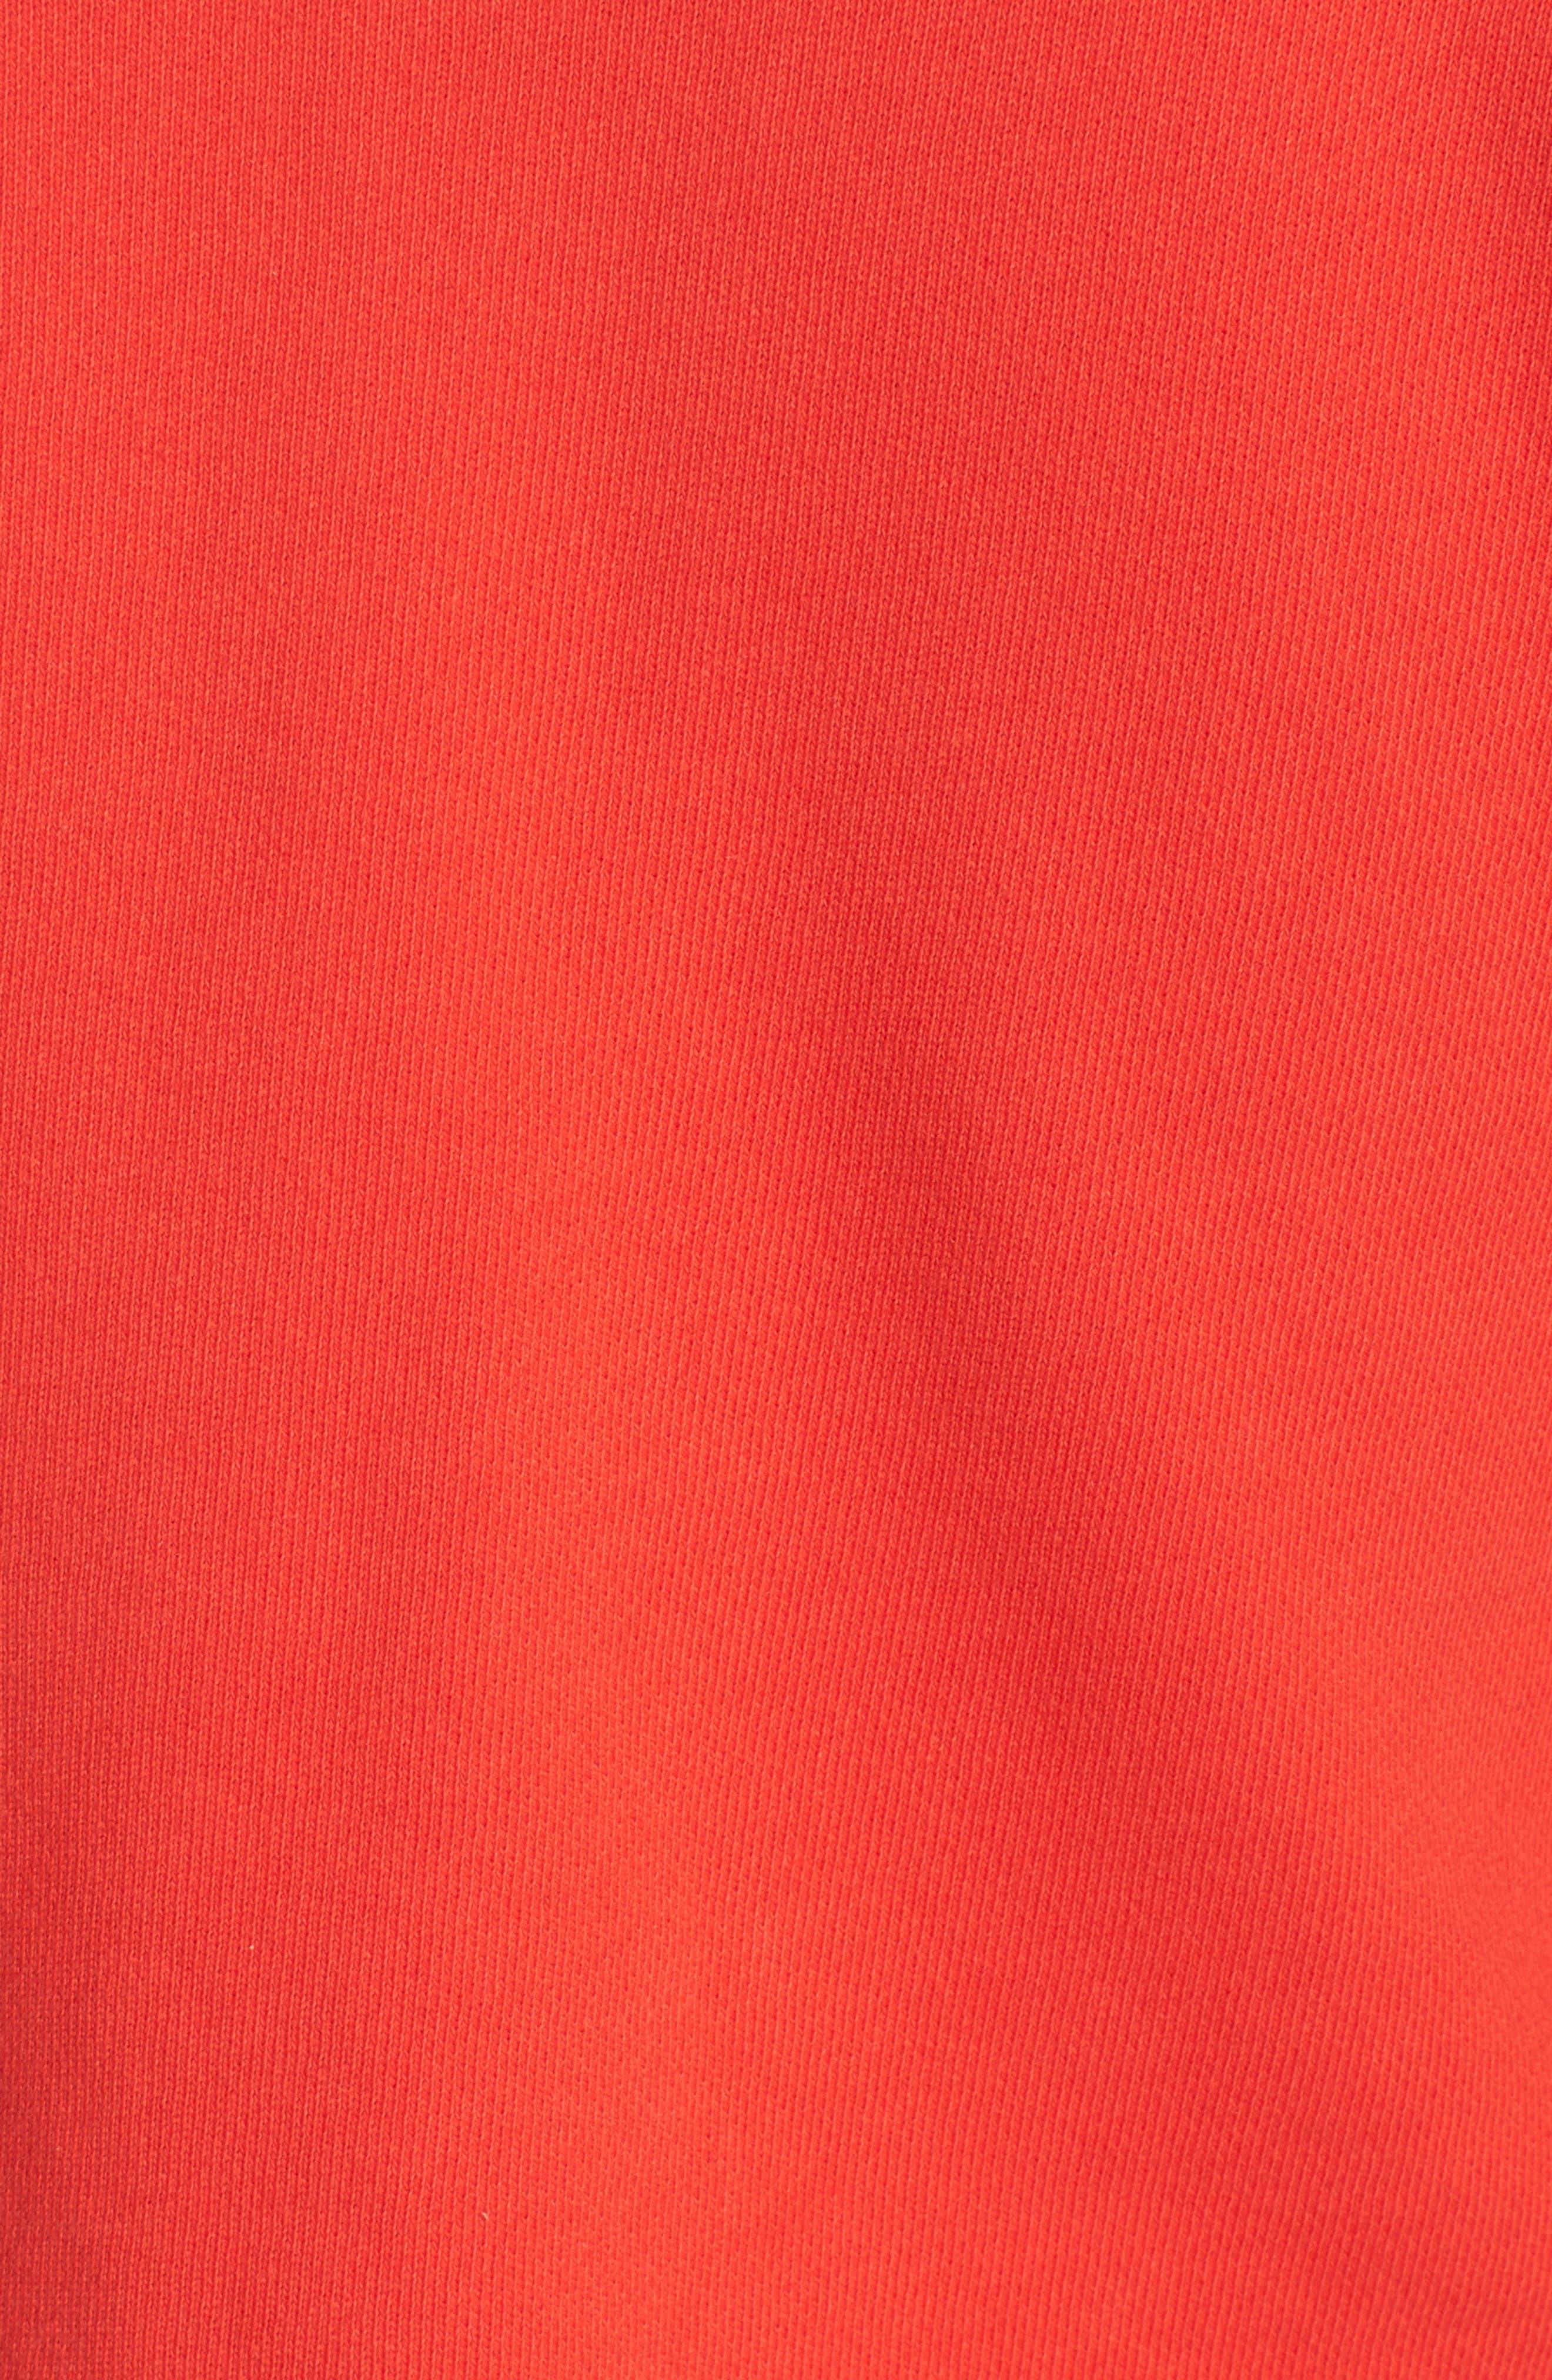 Alternate Image 5  - 7 For All Mankind® Flare Sleeve Crop Sweatshirt